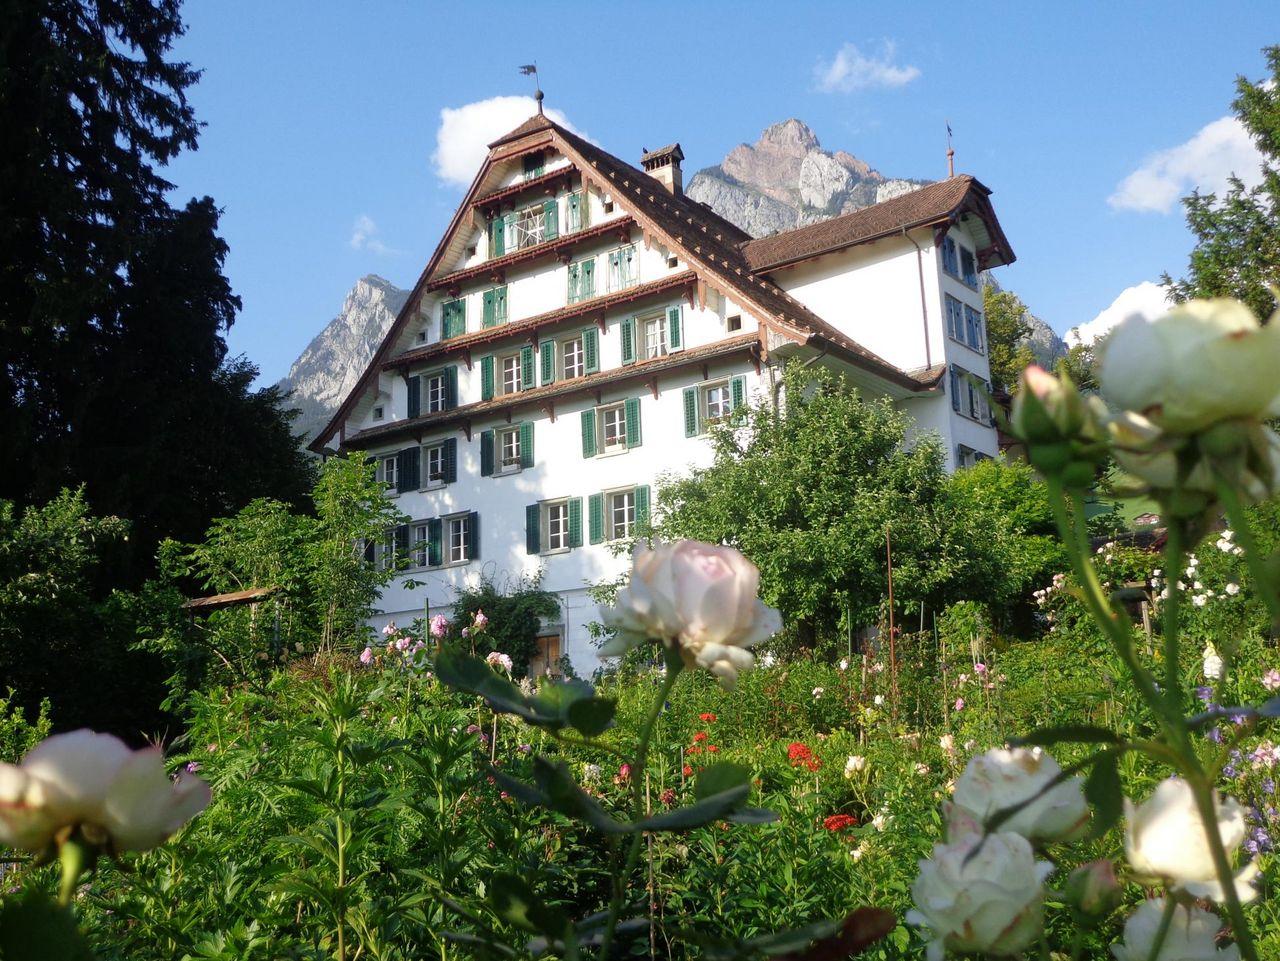 The manor houses of Schwyz